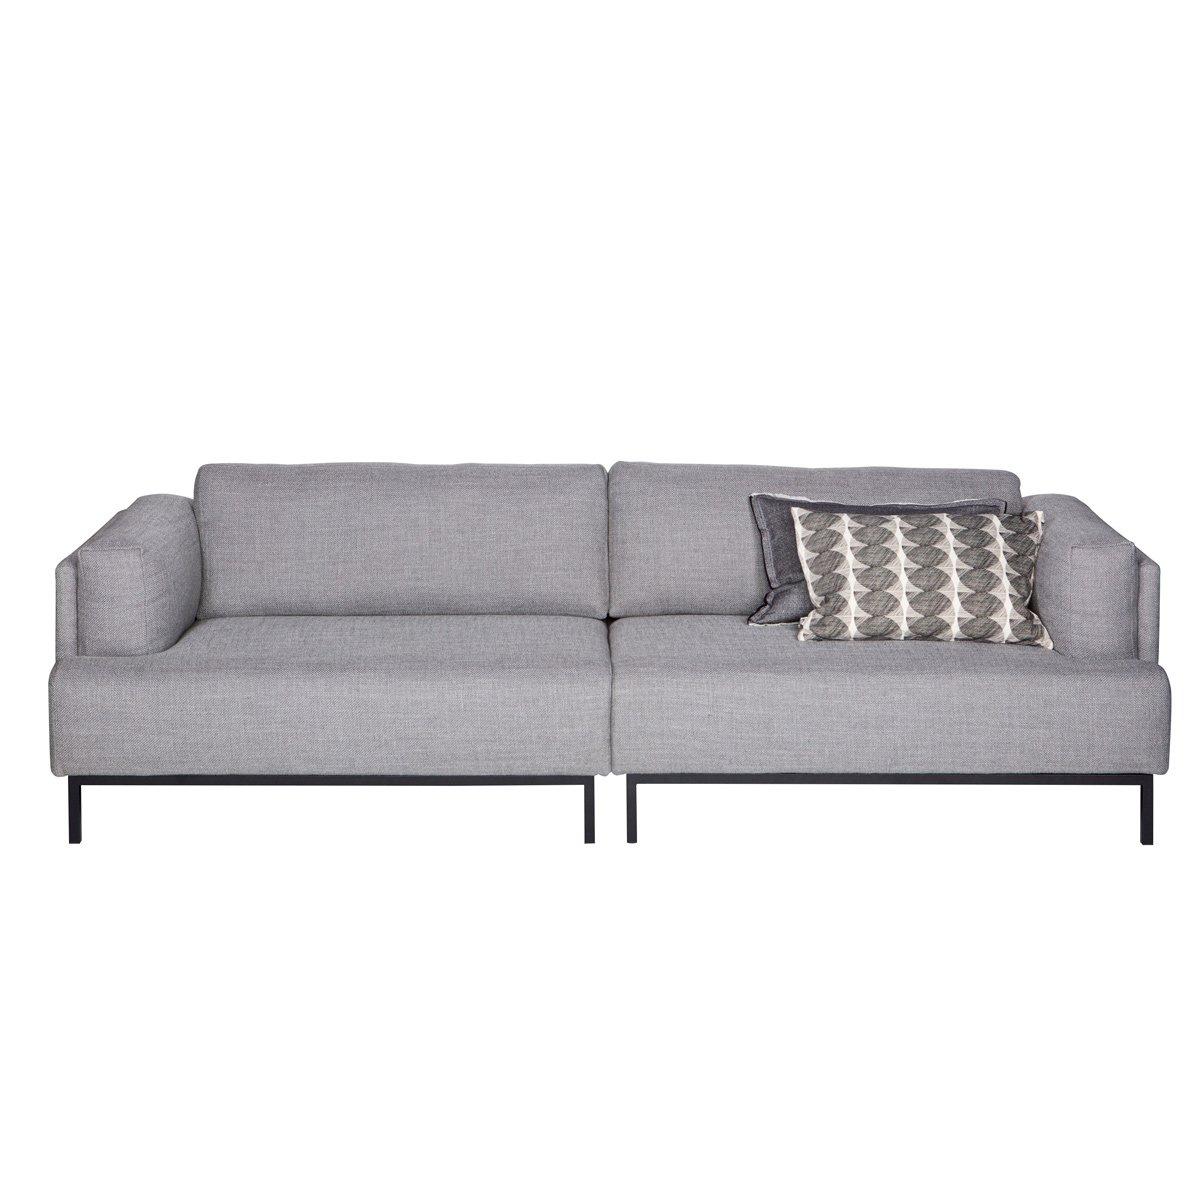 lounge-zone Sofa Couch 3-Sitzer UMA Metallgestell Stoffbezug Breite 250cm grau 14012